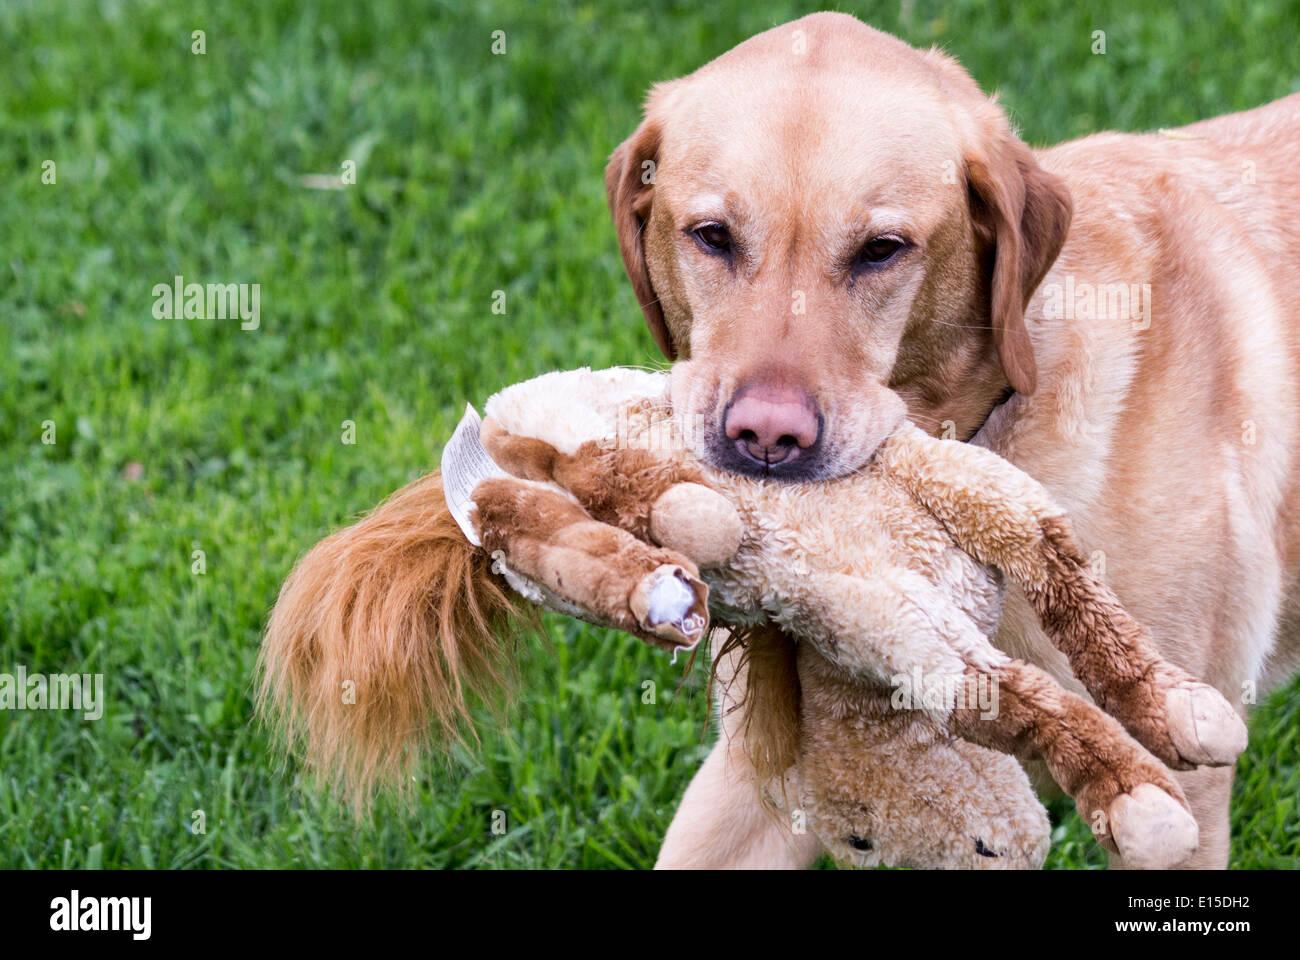 Yellow Labrador Retriever Dog Carrying A Toy Stuffed Horse